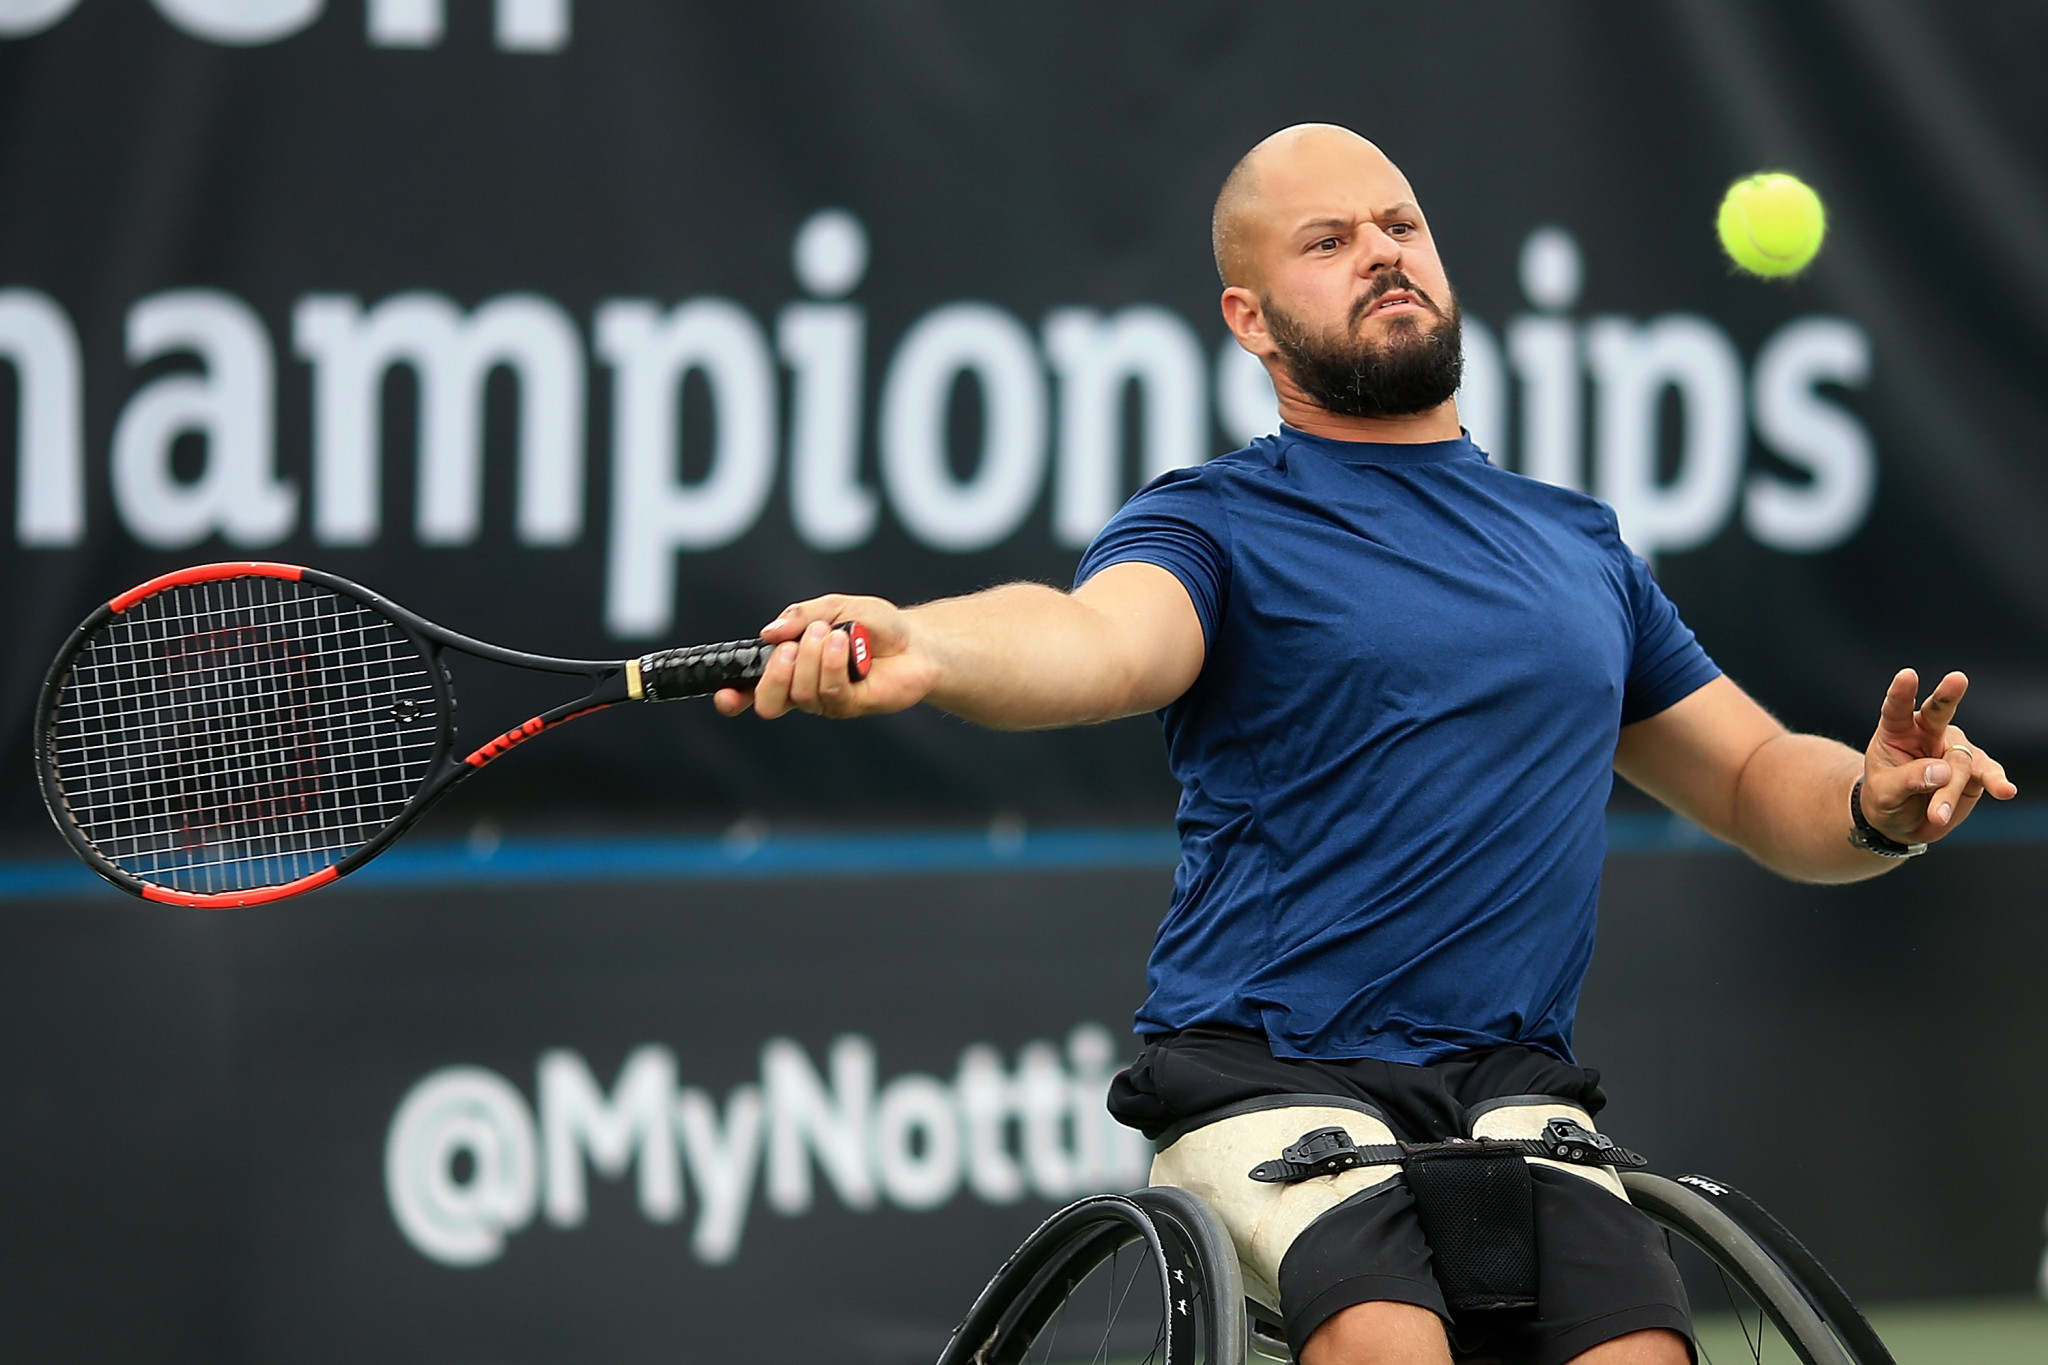 Wimbledon champion Olsson cruises into last-eight at ITF Belgian Open Wheelchair Tennis Championships